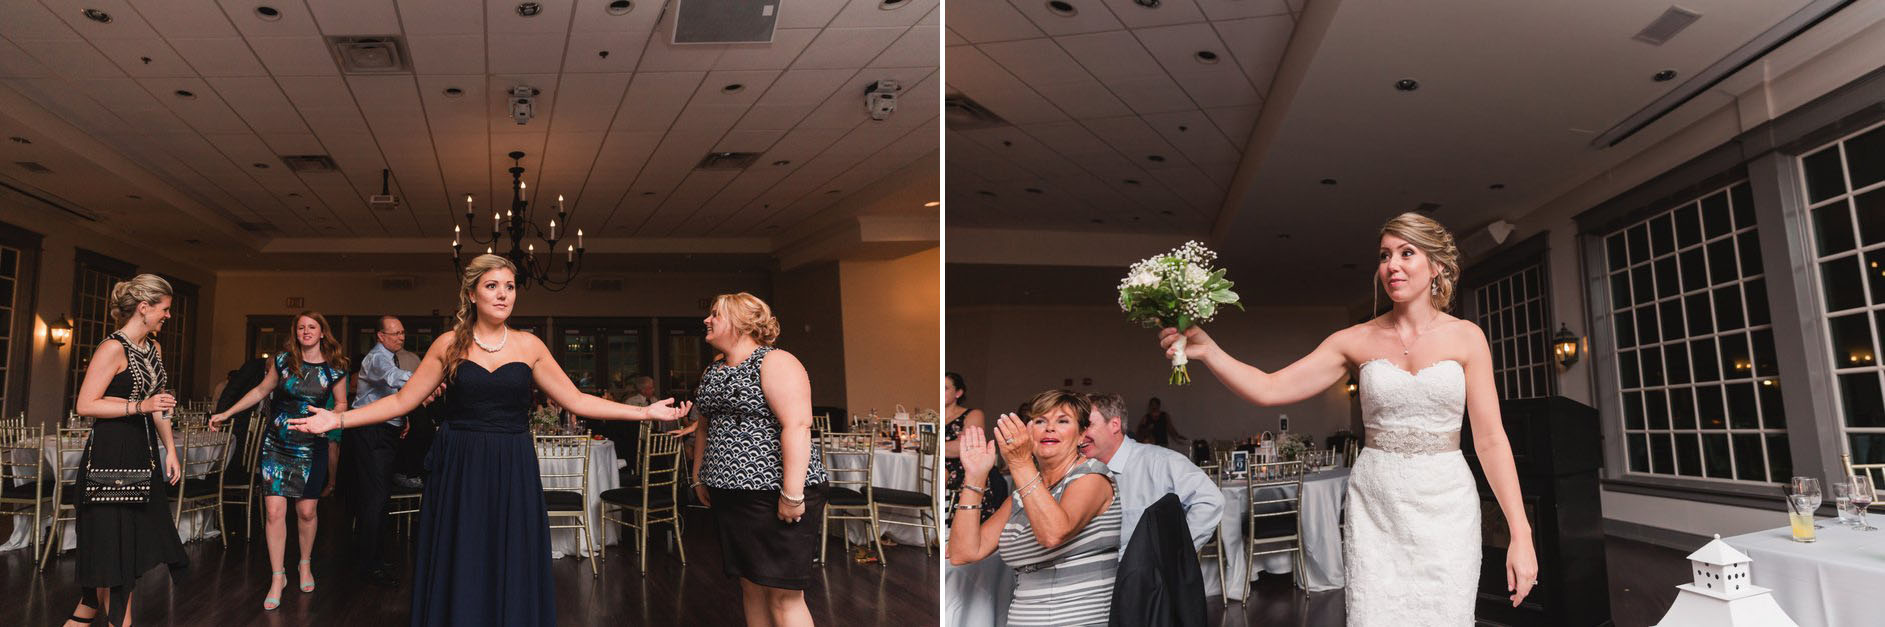 Kleinburg-Doctors-house-wedding-J-C-2016-073